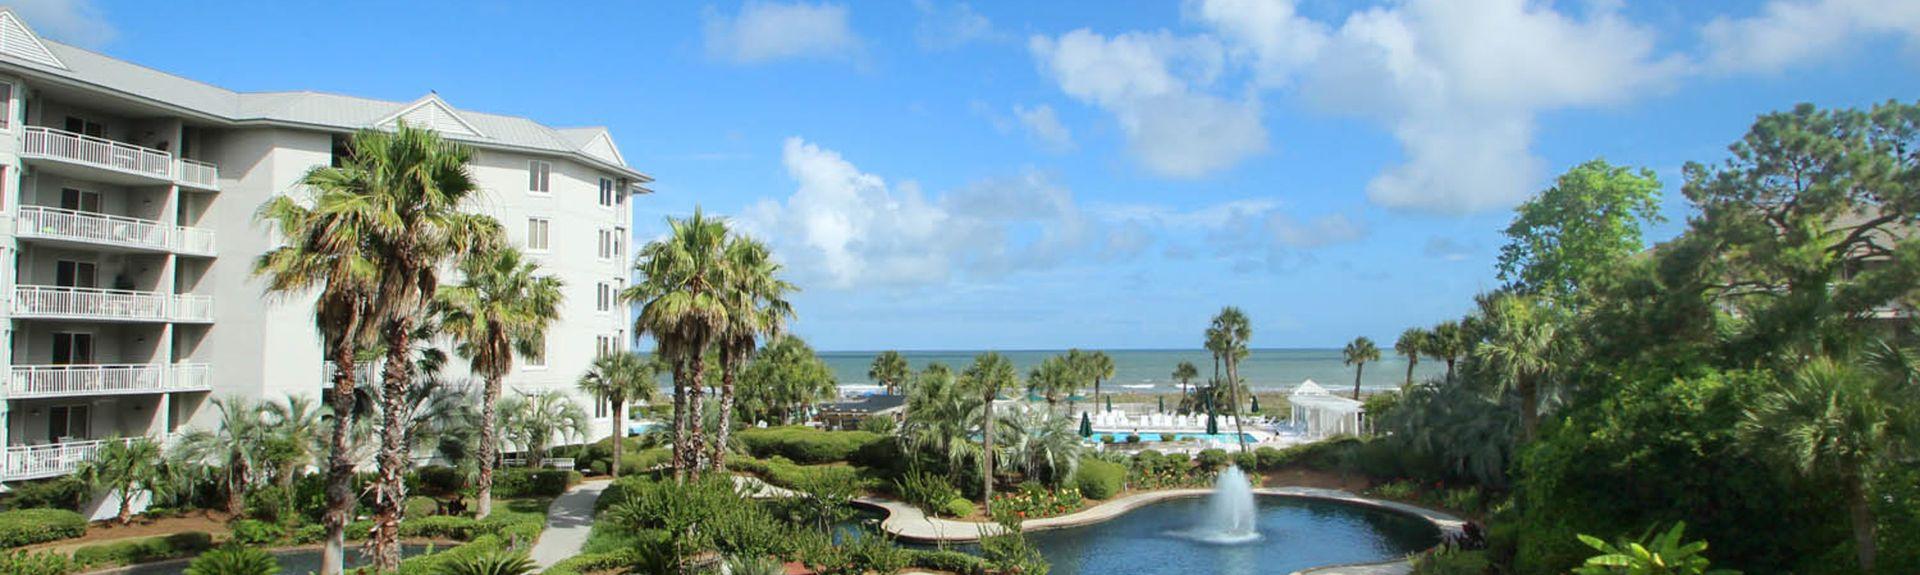 Sea Crest Villas. Hilton Head Island, SC, USA